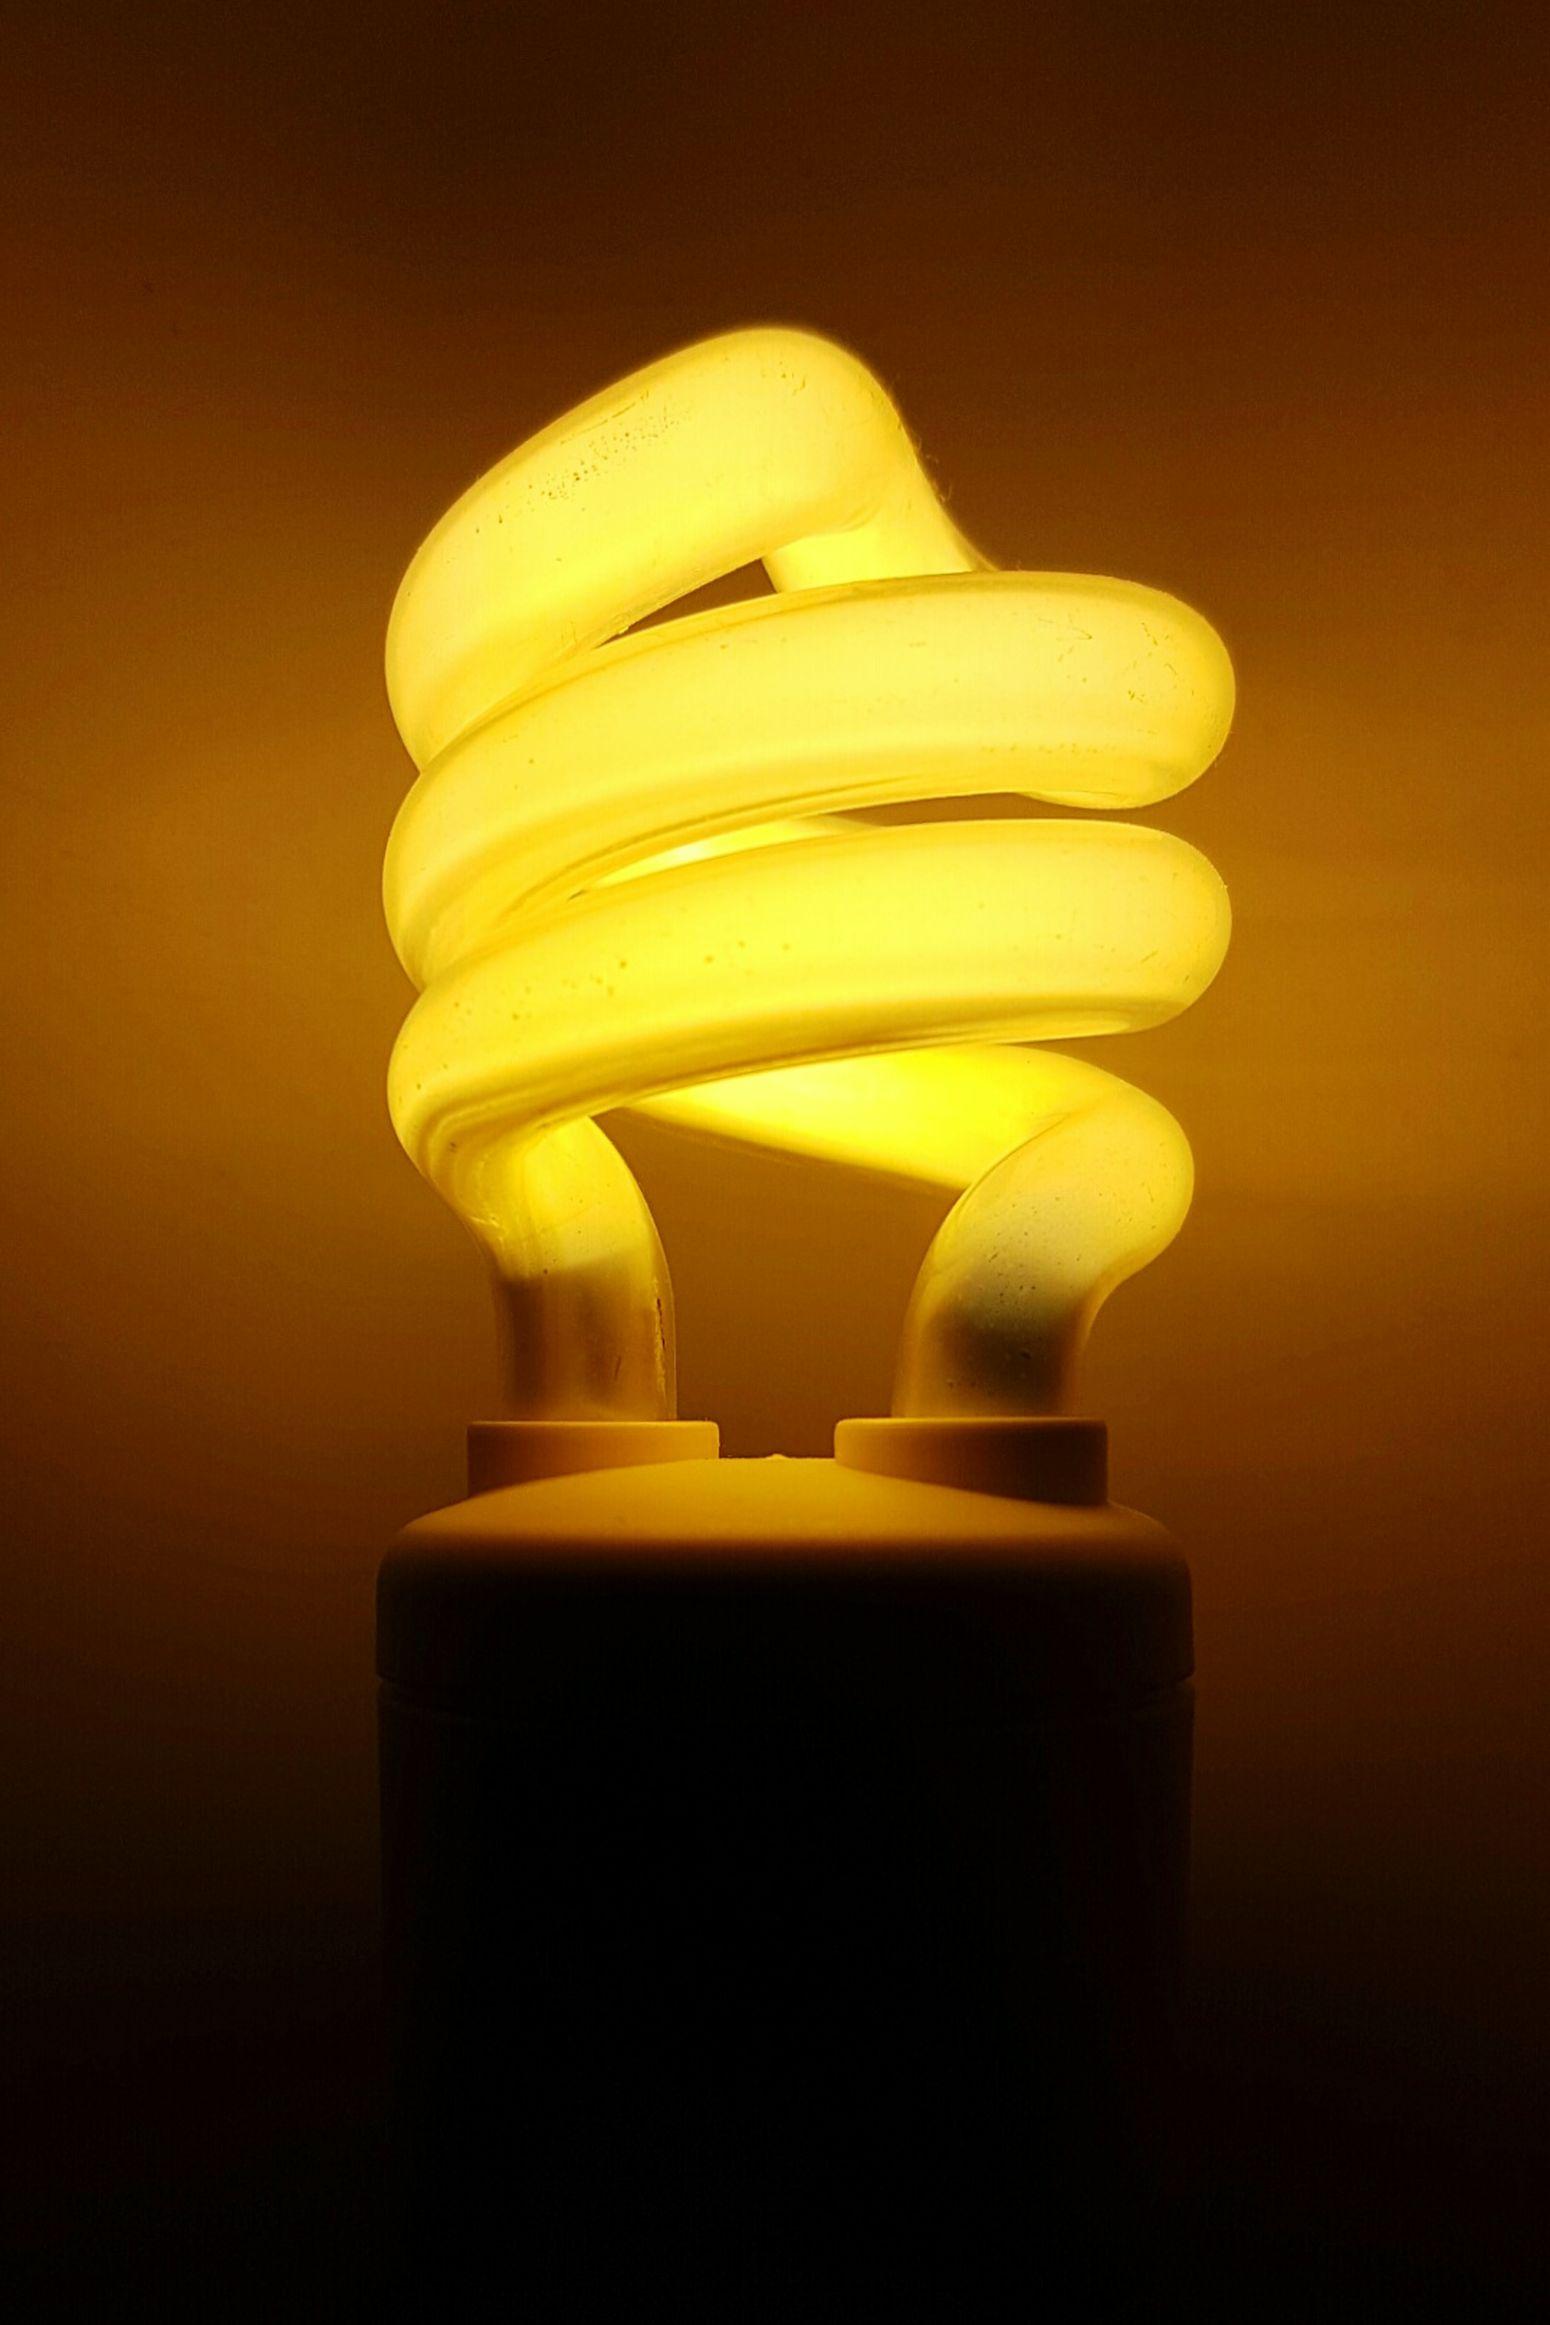 Lighting Equipment Light In The Darkness Light Bulb Close-up New Idea Light Questioning Mystical Atmosphere Genius Geniusidea